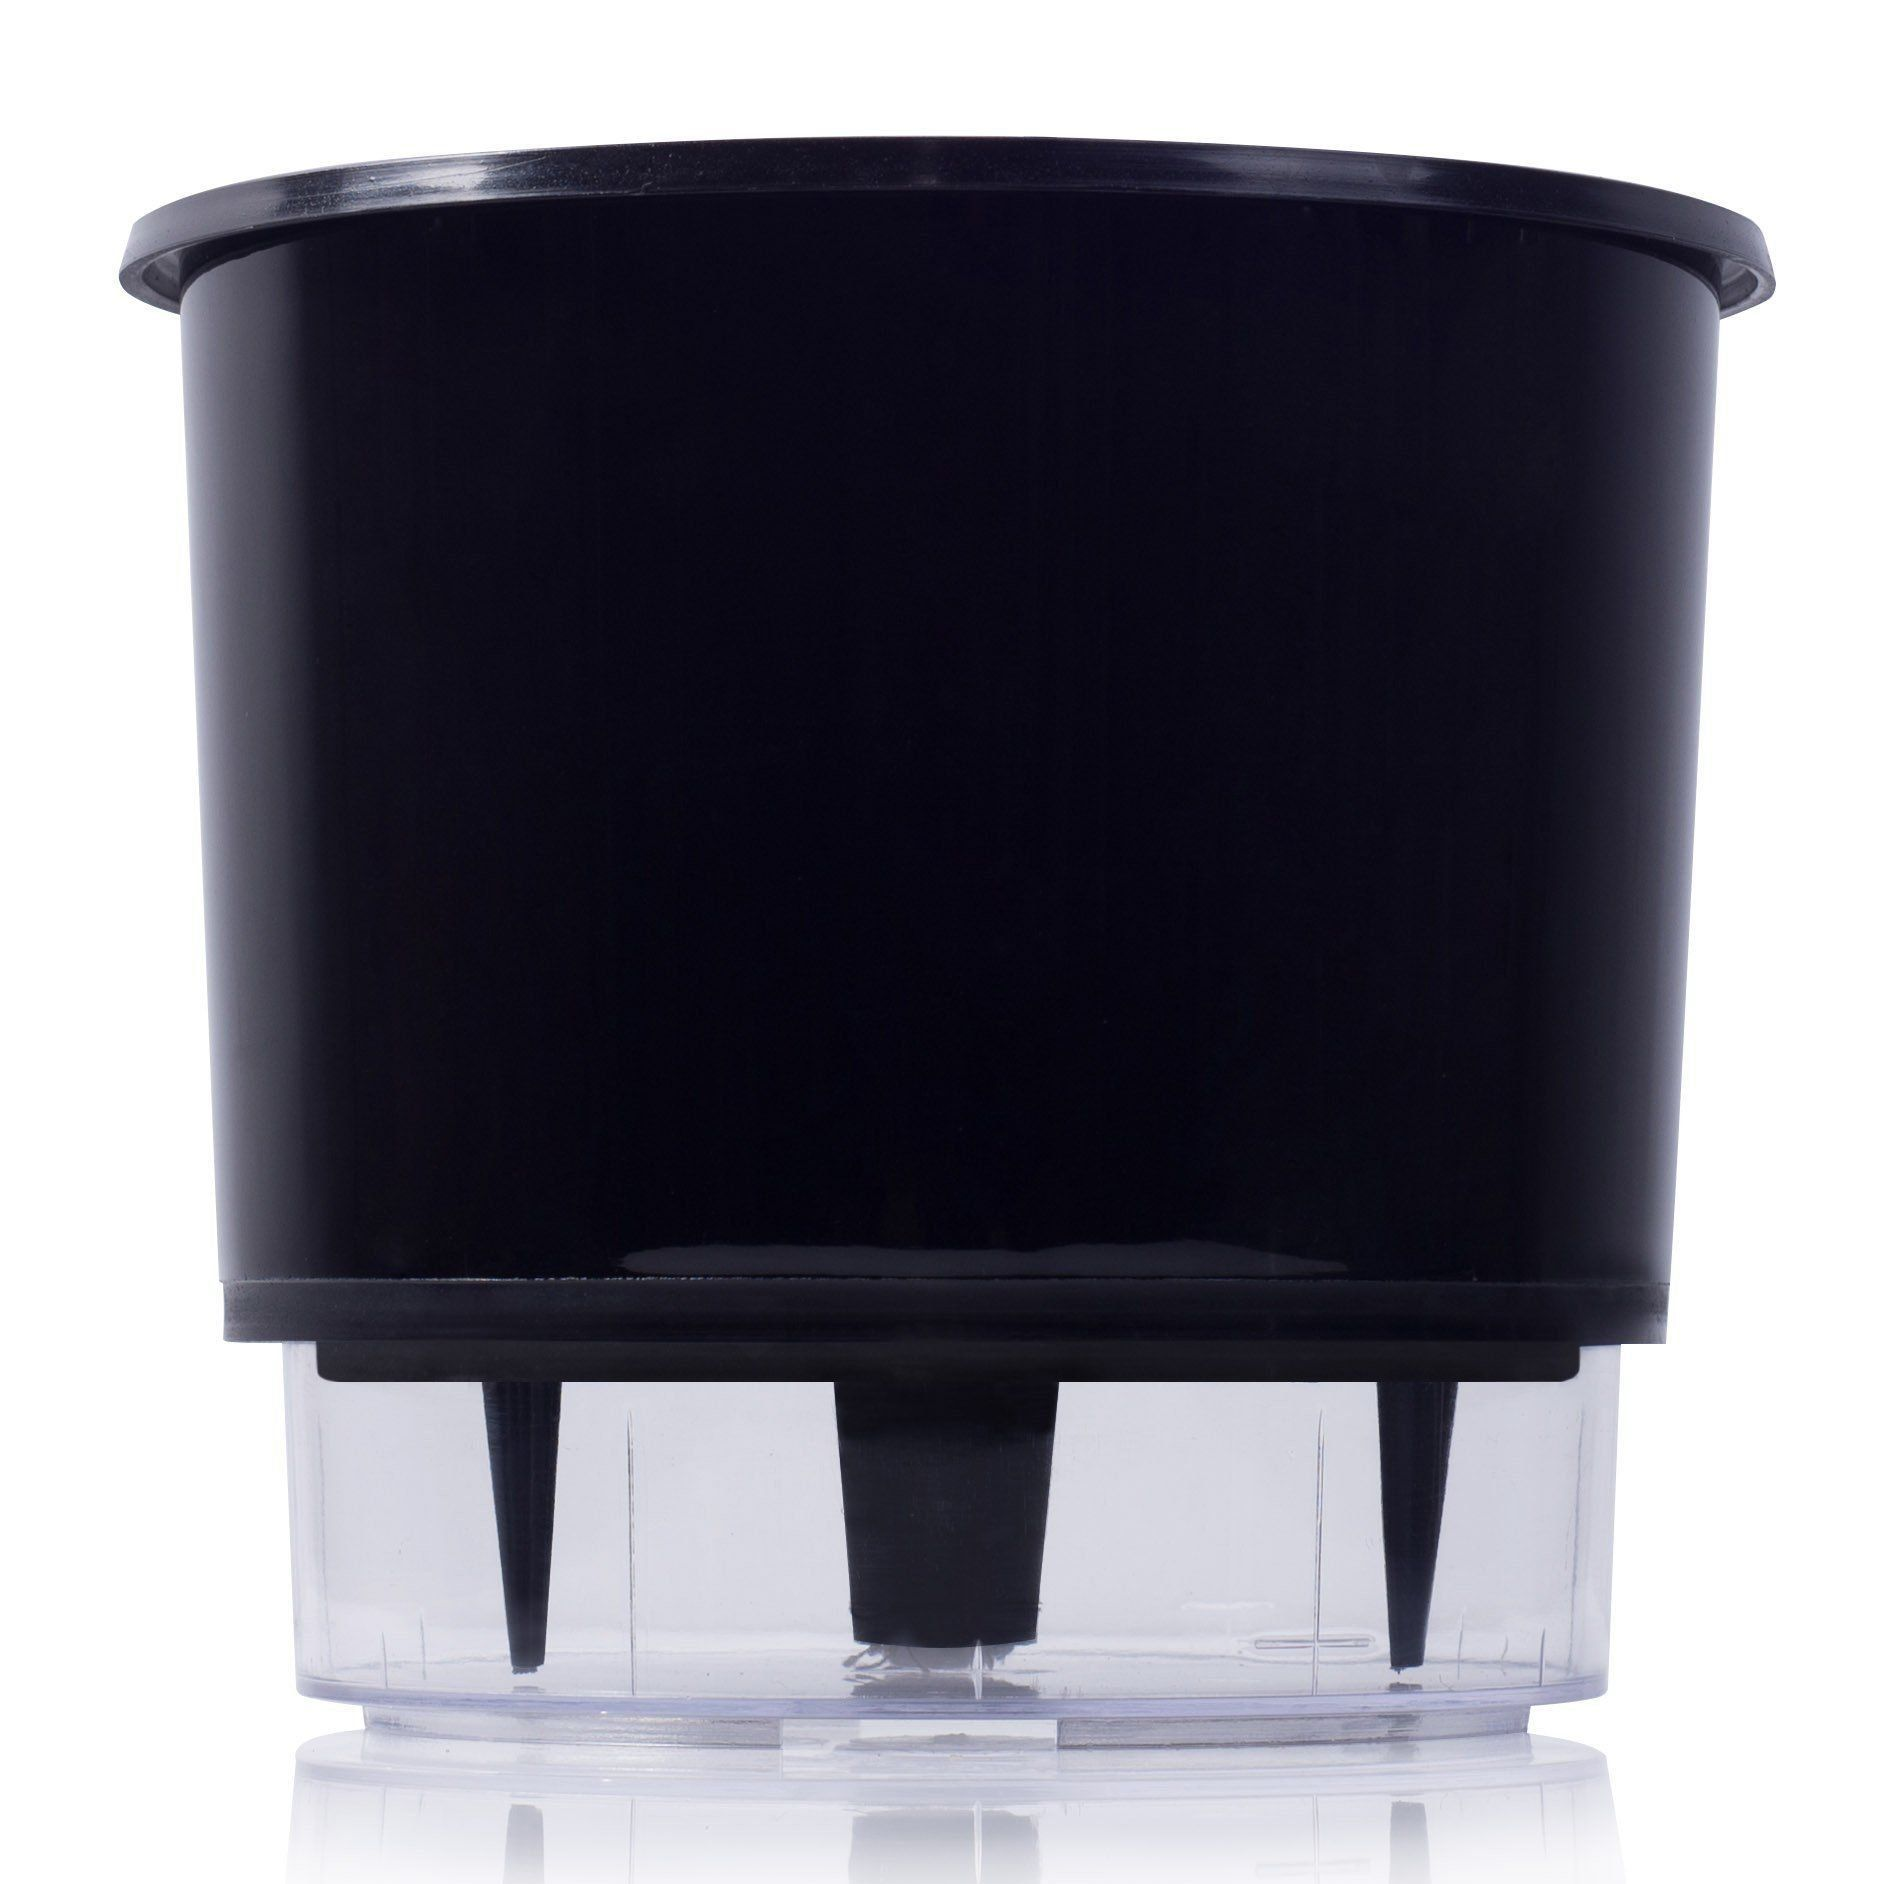 Vaso Autoirrigável Grande 21,5cm x 18cm Preto